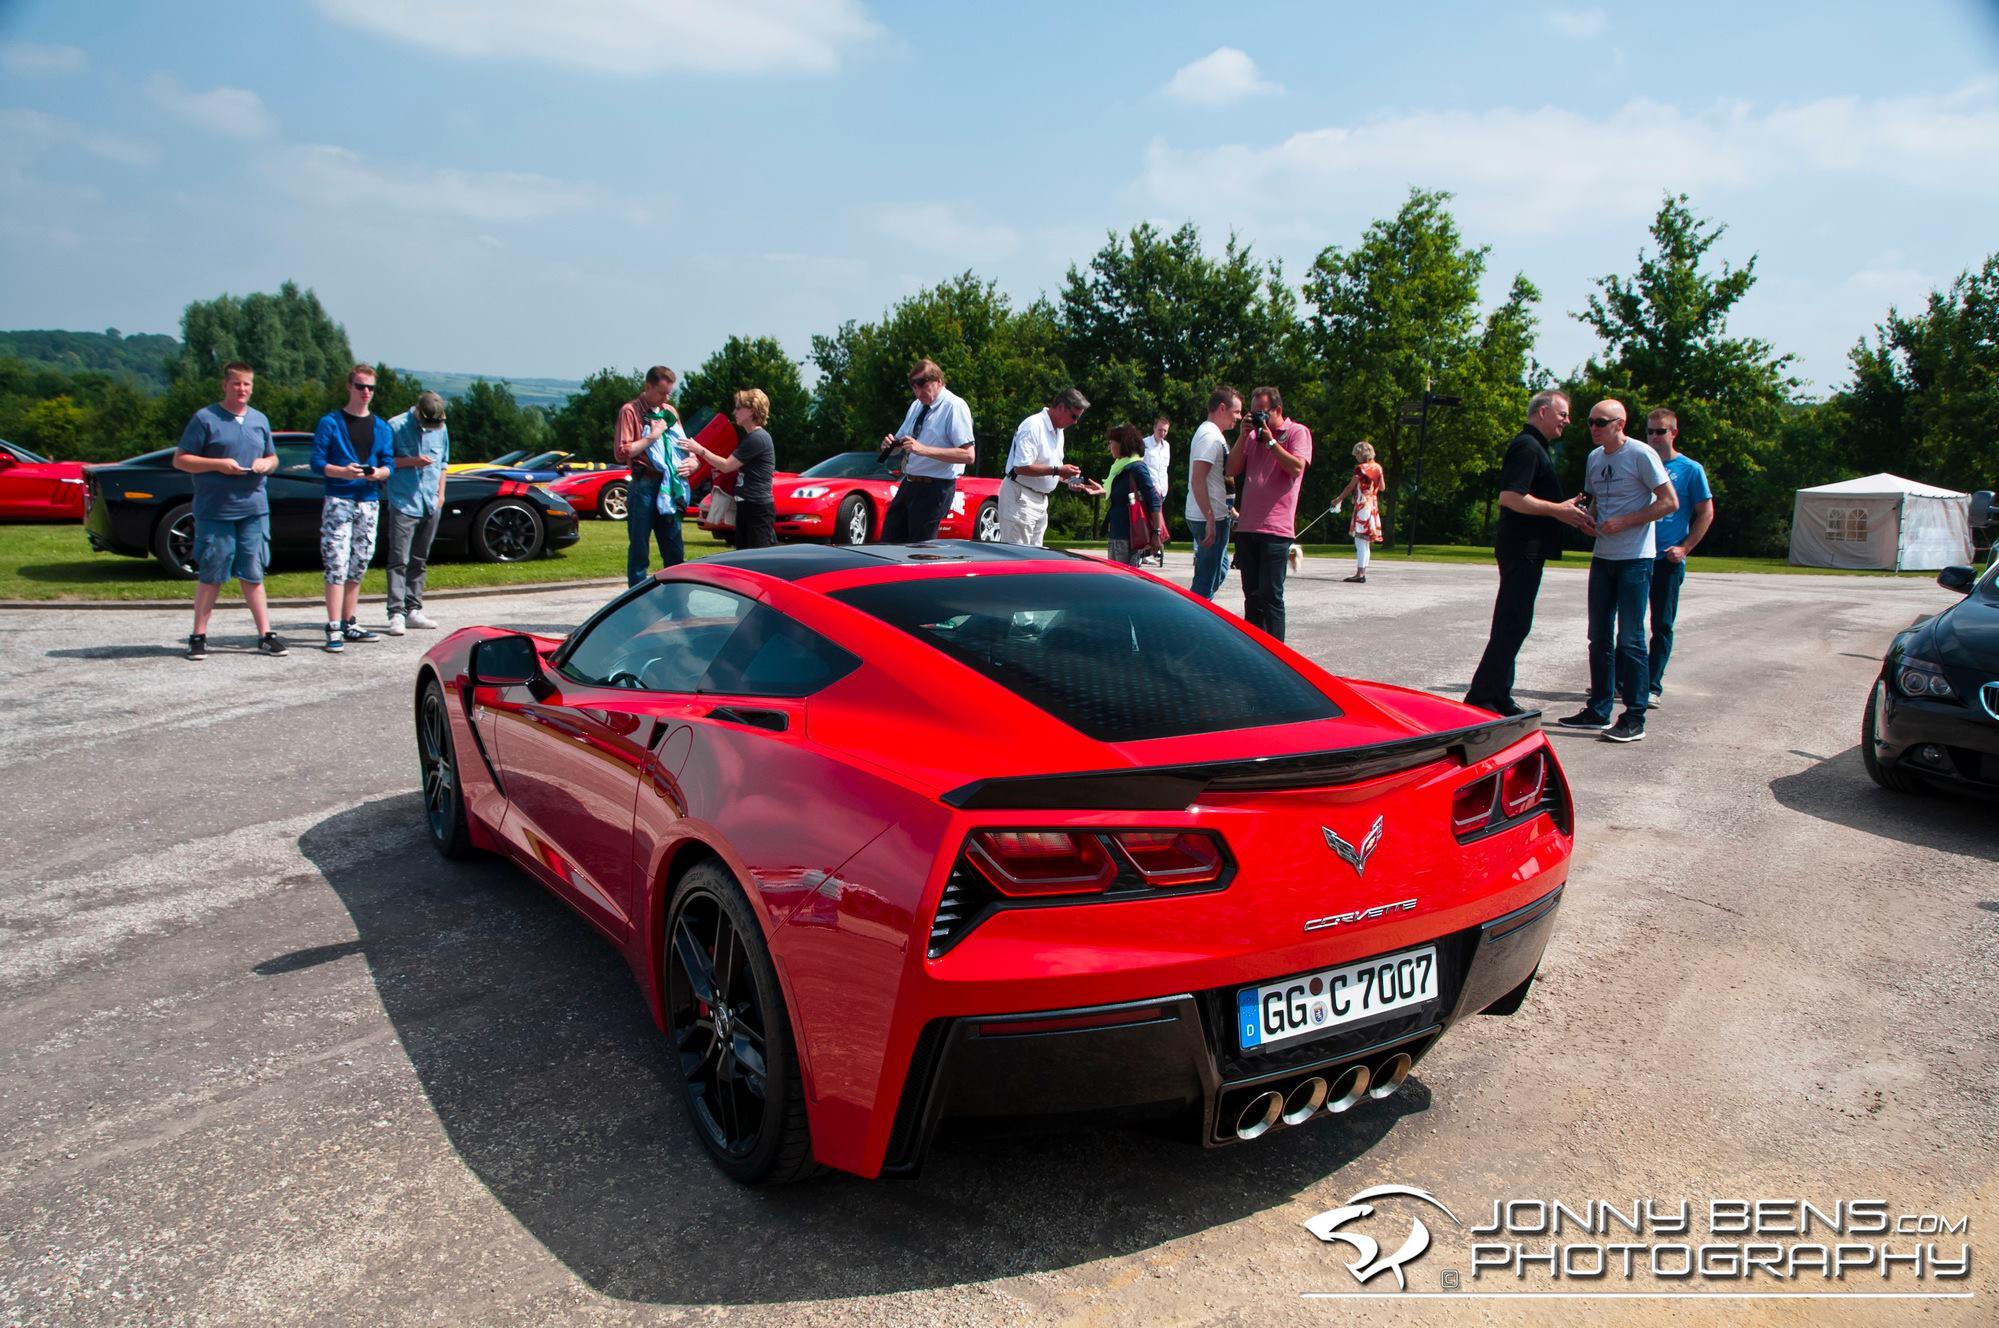 Corvette C7 Stingray - www.hartvoorautos.nl